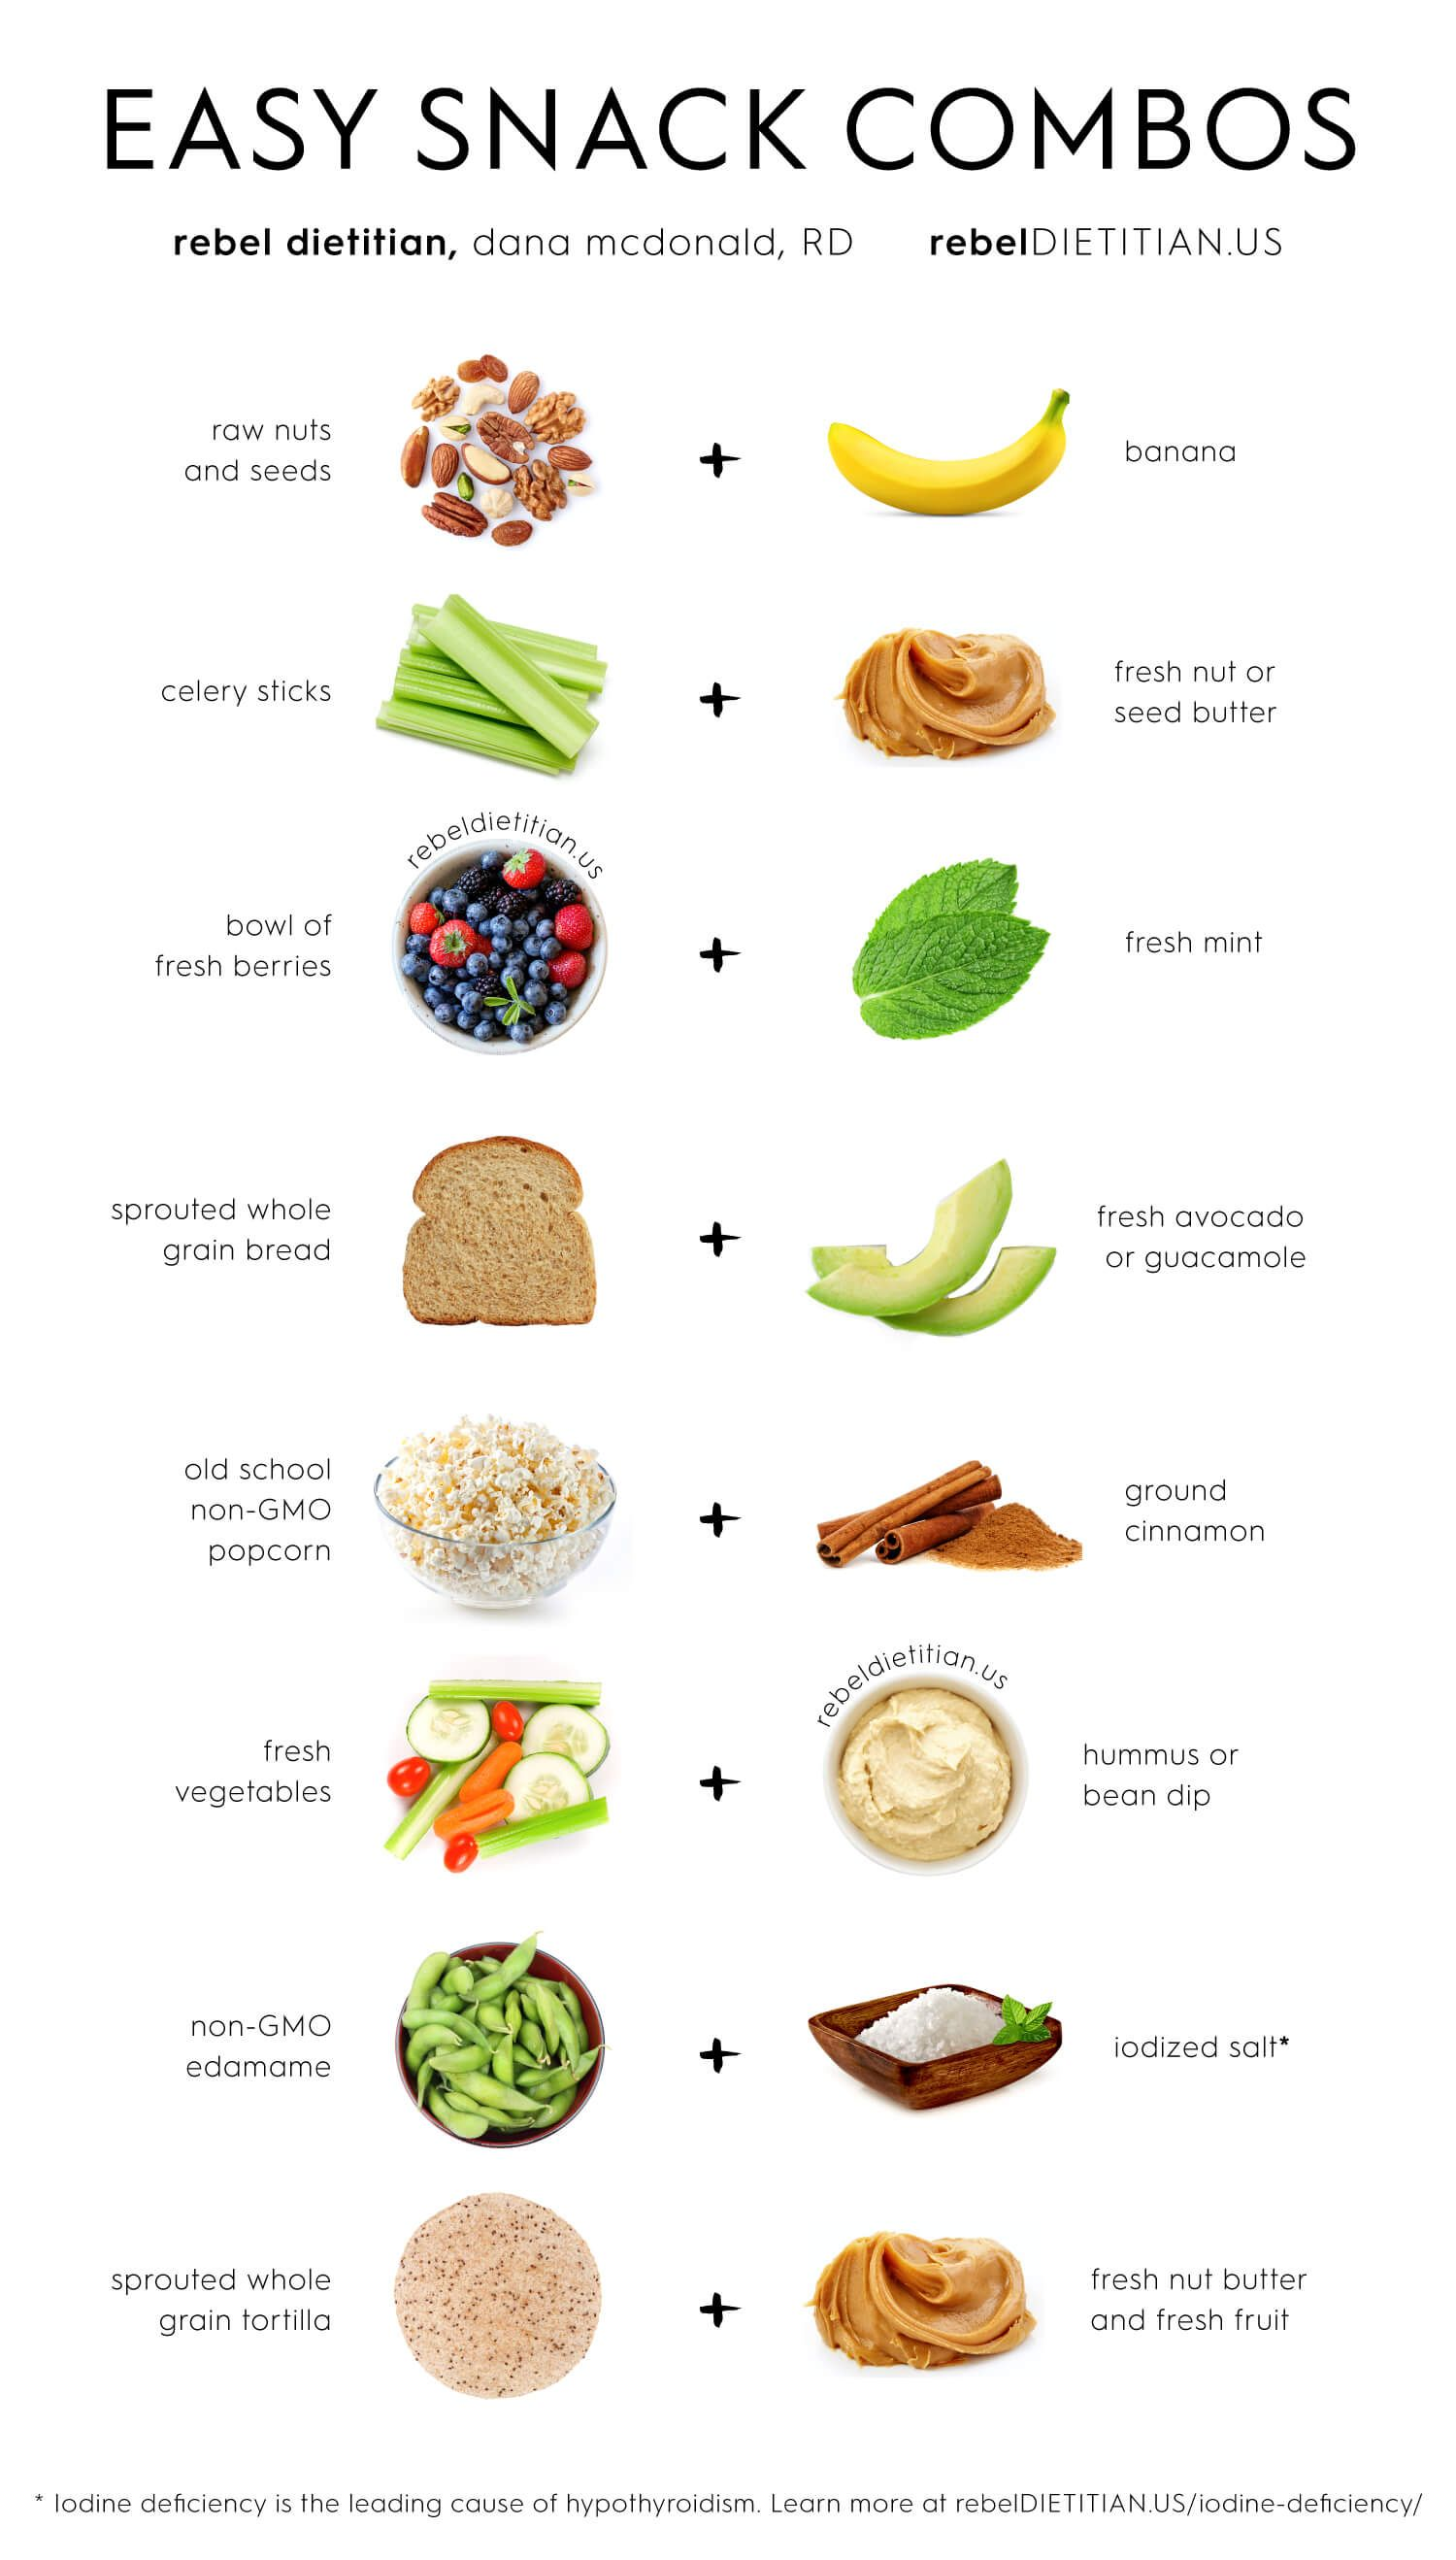 healthy snacks recipe pinterest ges ndeste snacks snacks und gesund. Black Bedroom Furniture Sets. Home Design Ideas